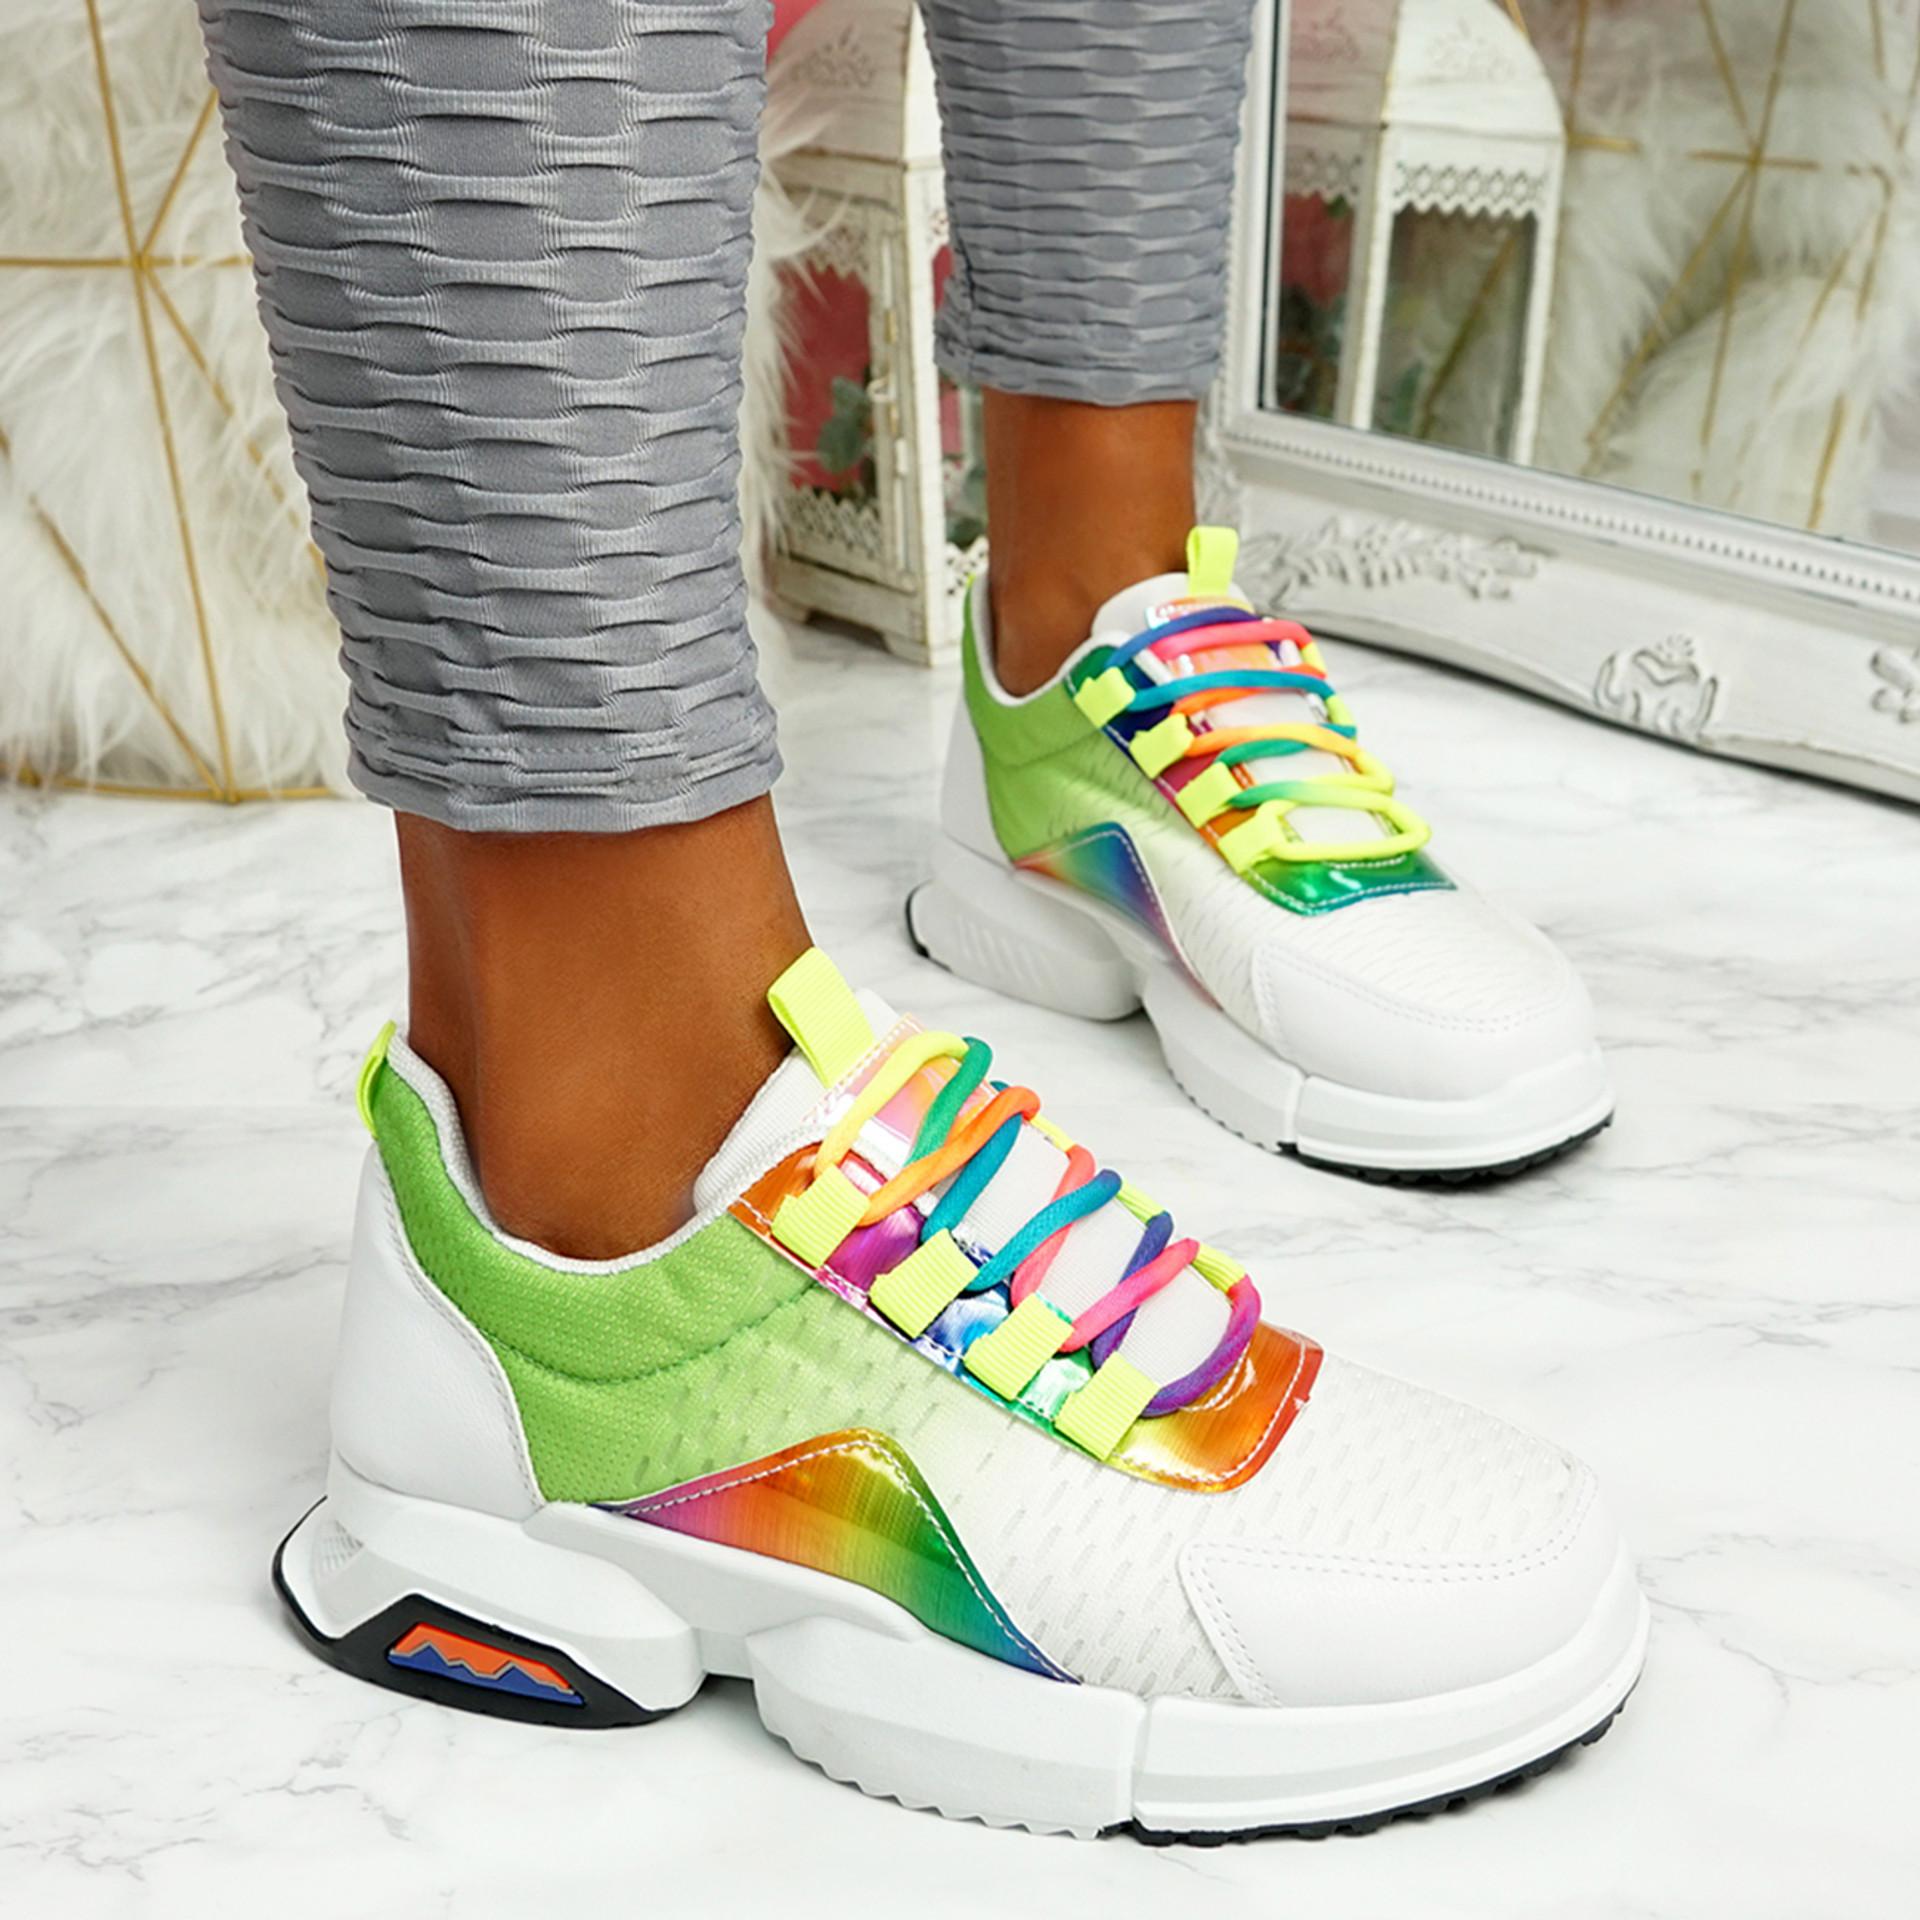 Potto Green Chunky Rainbow Trainers